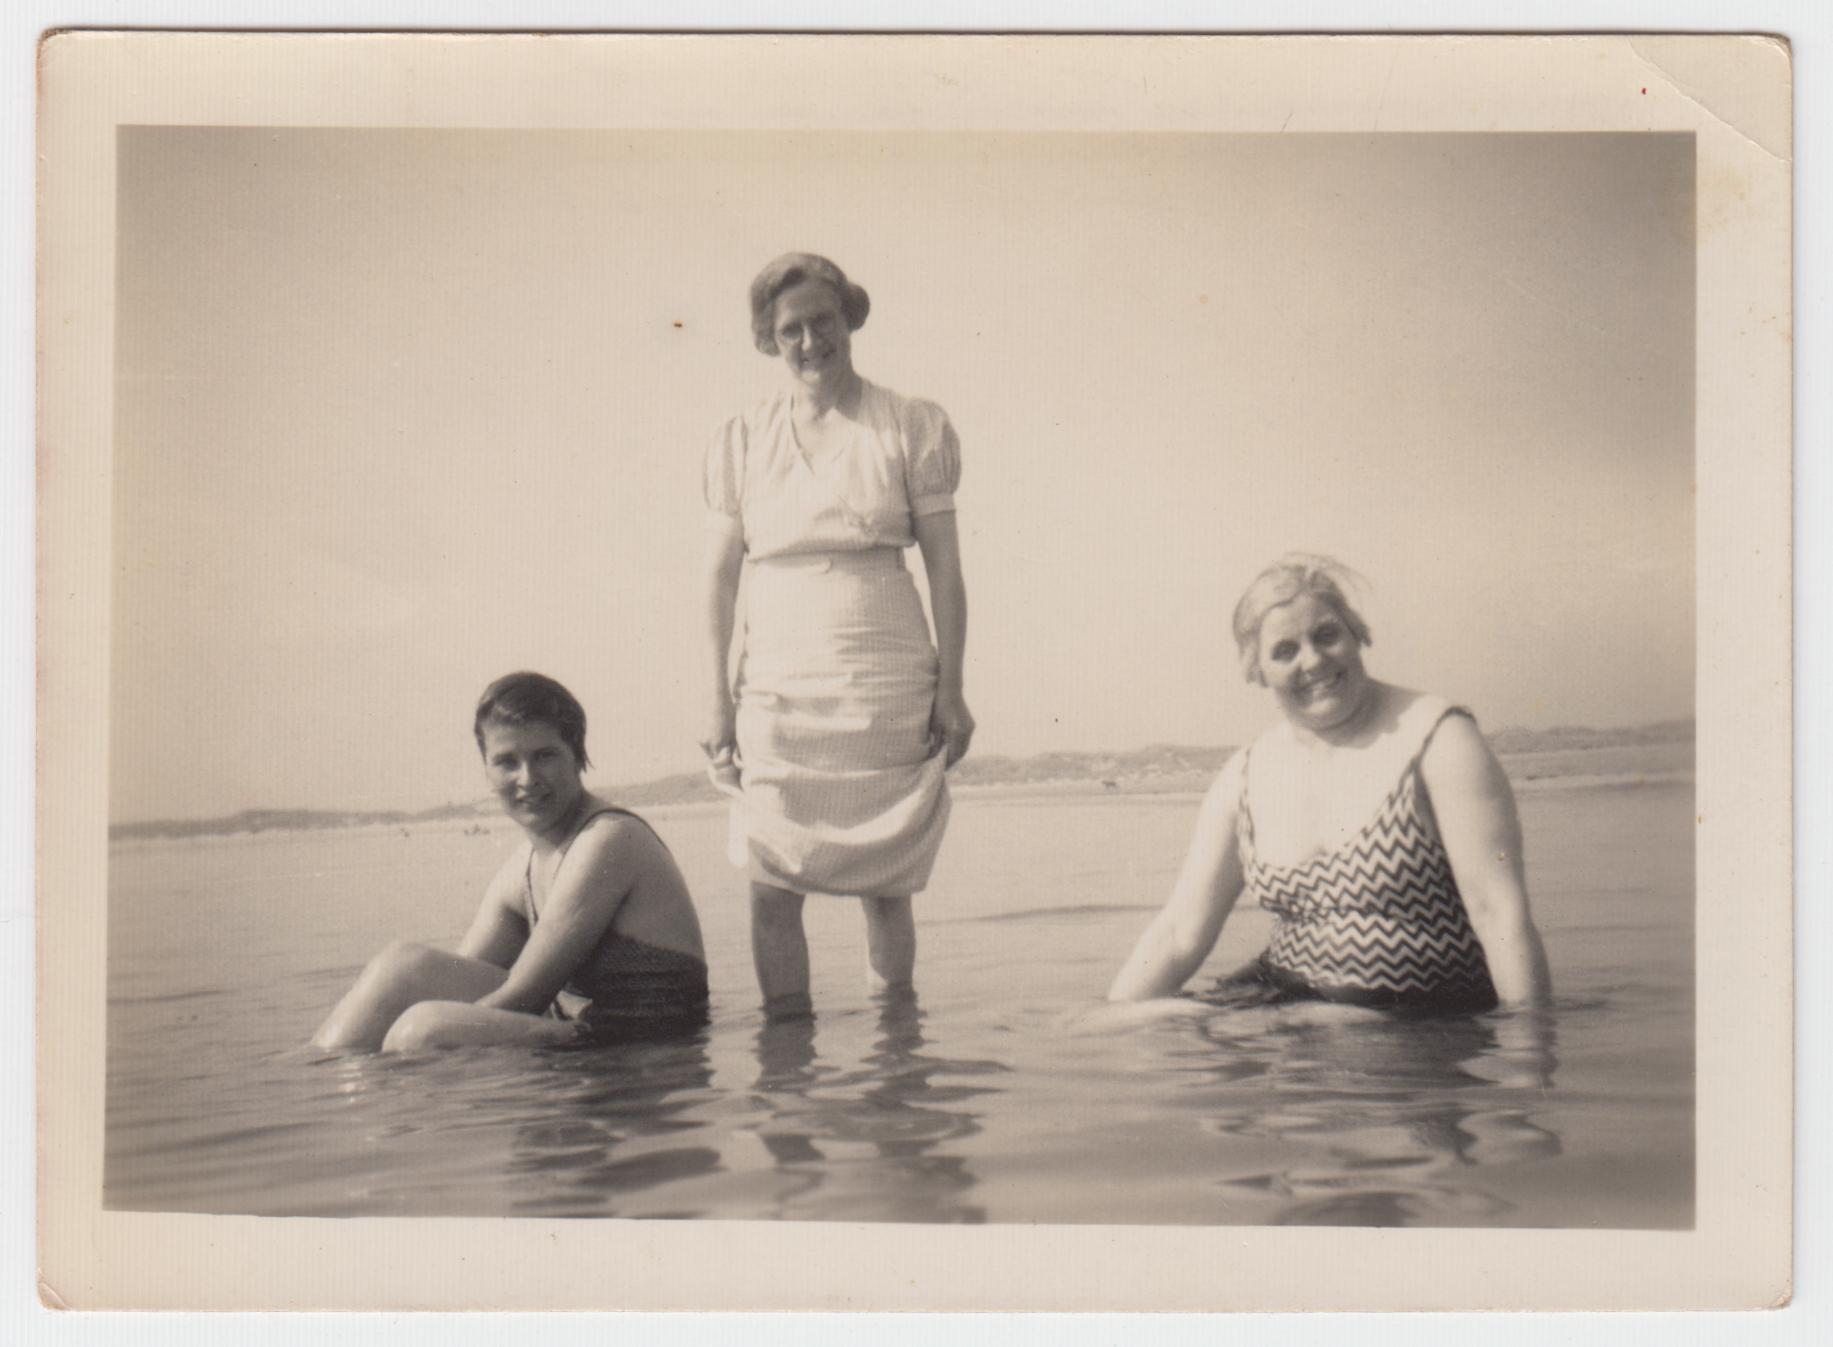 Elsie - Rhosneigs 1938